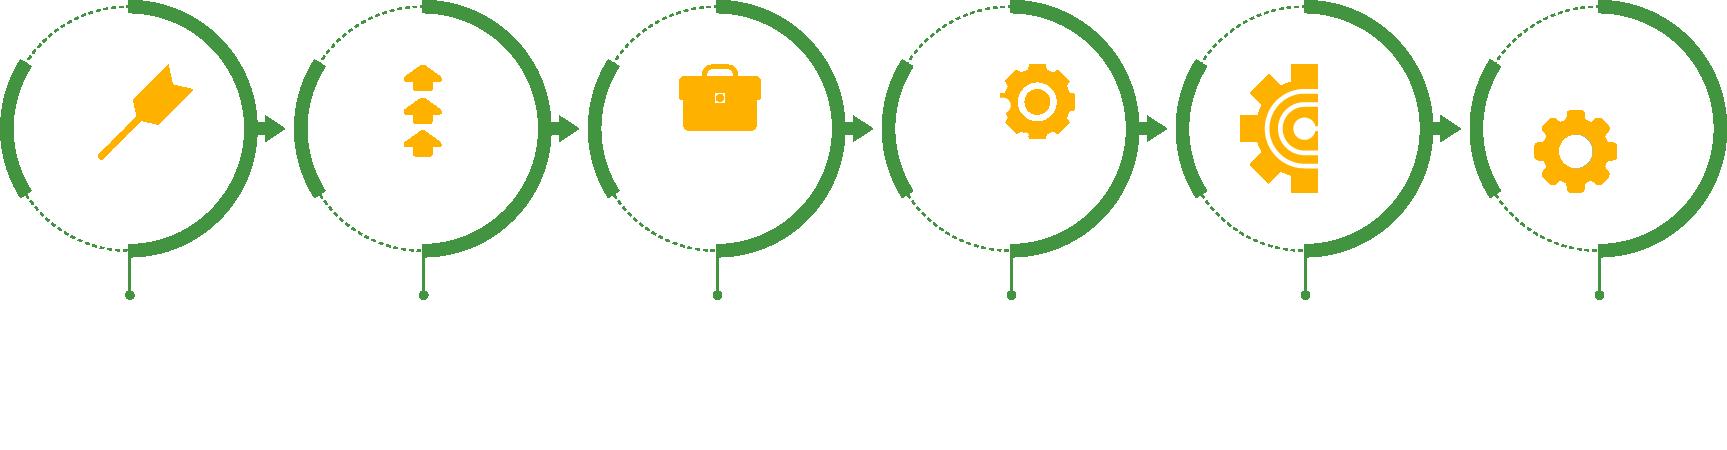 Digital Next Road Map